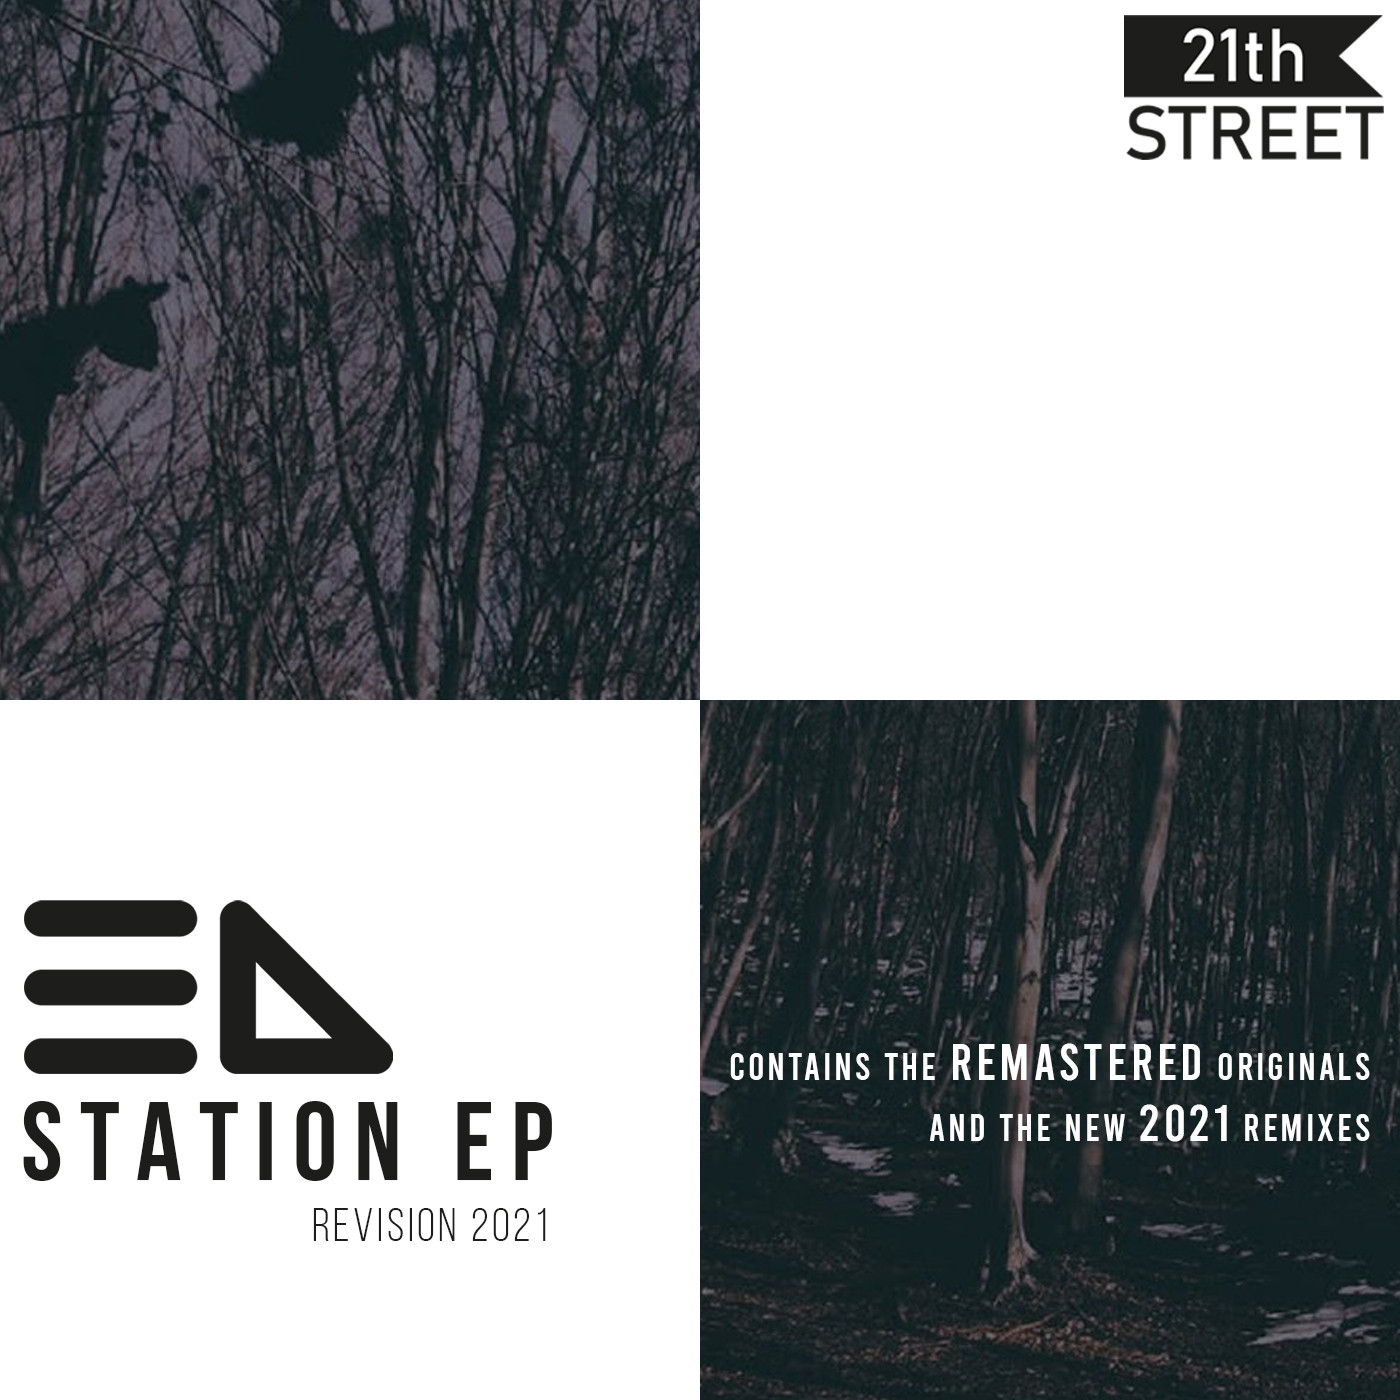 premiere: Entoniu & Agape - Talisman [21th Street Records]